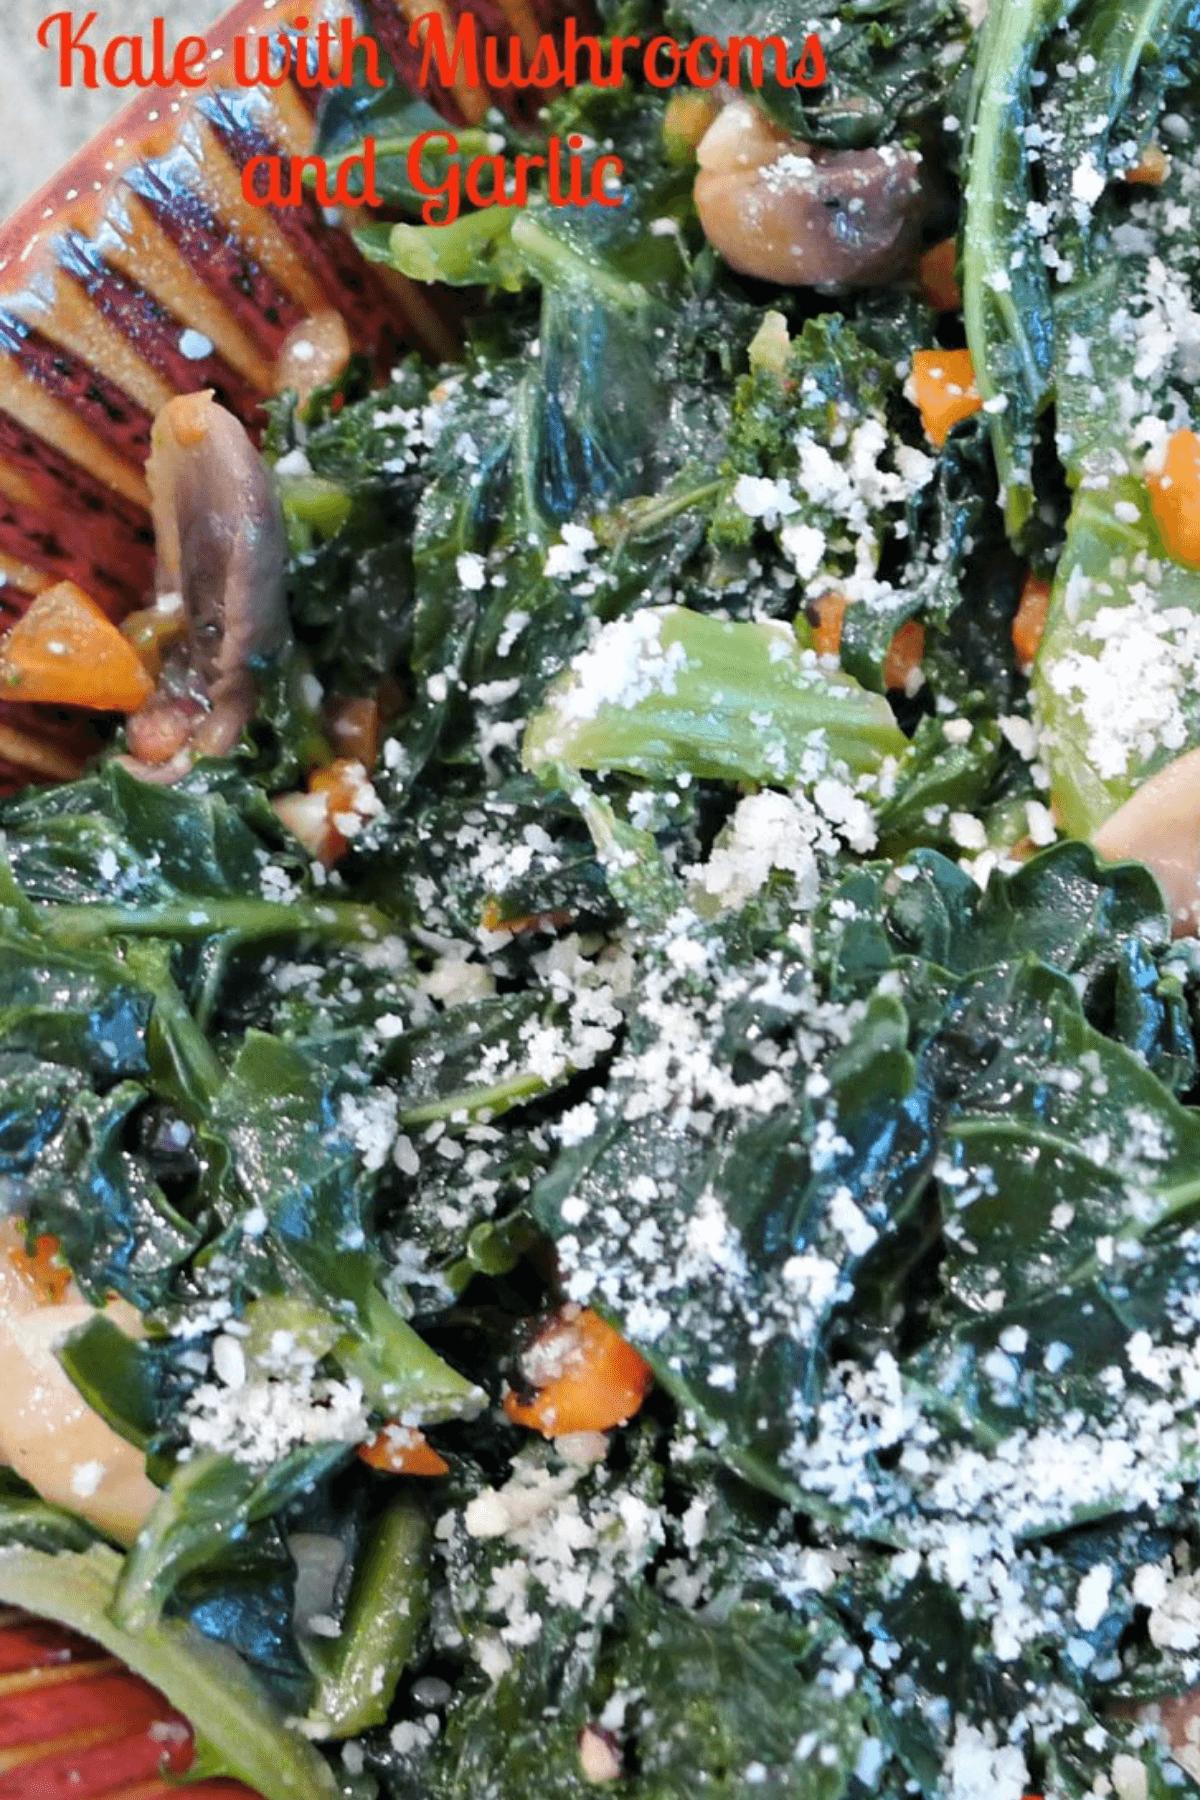 Close up of Black Tuscan Kale with Mushrooms and Garlic